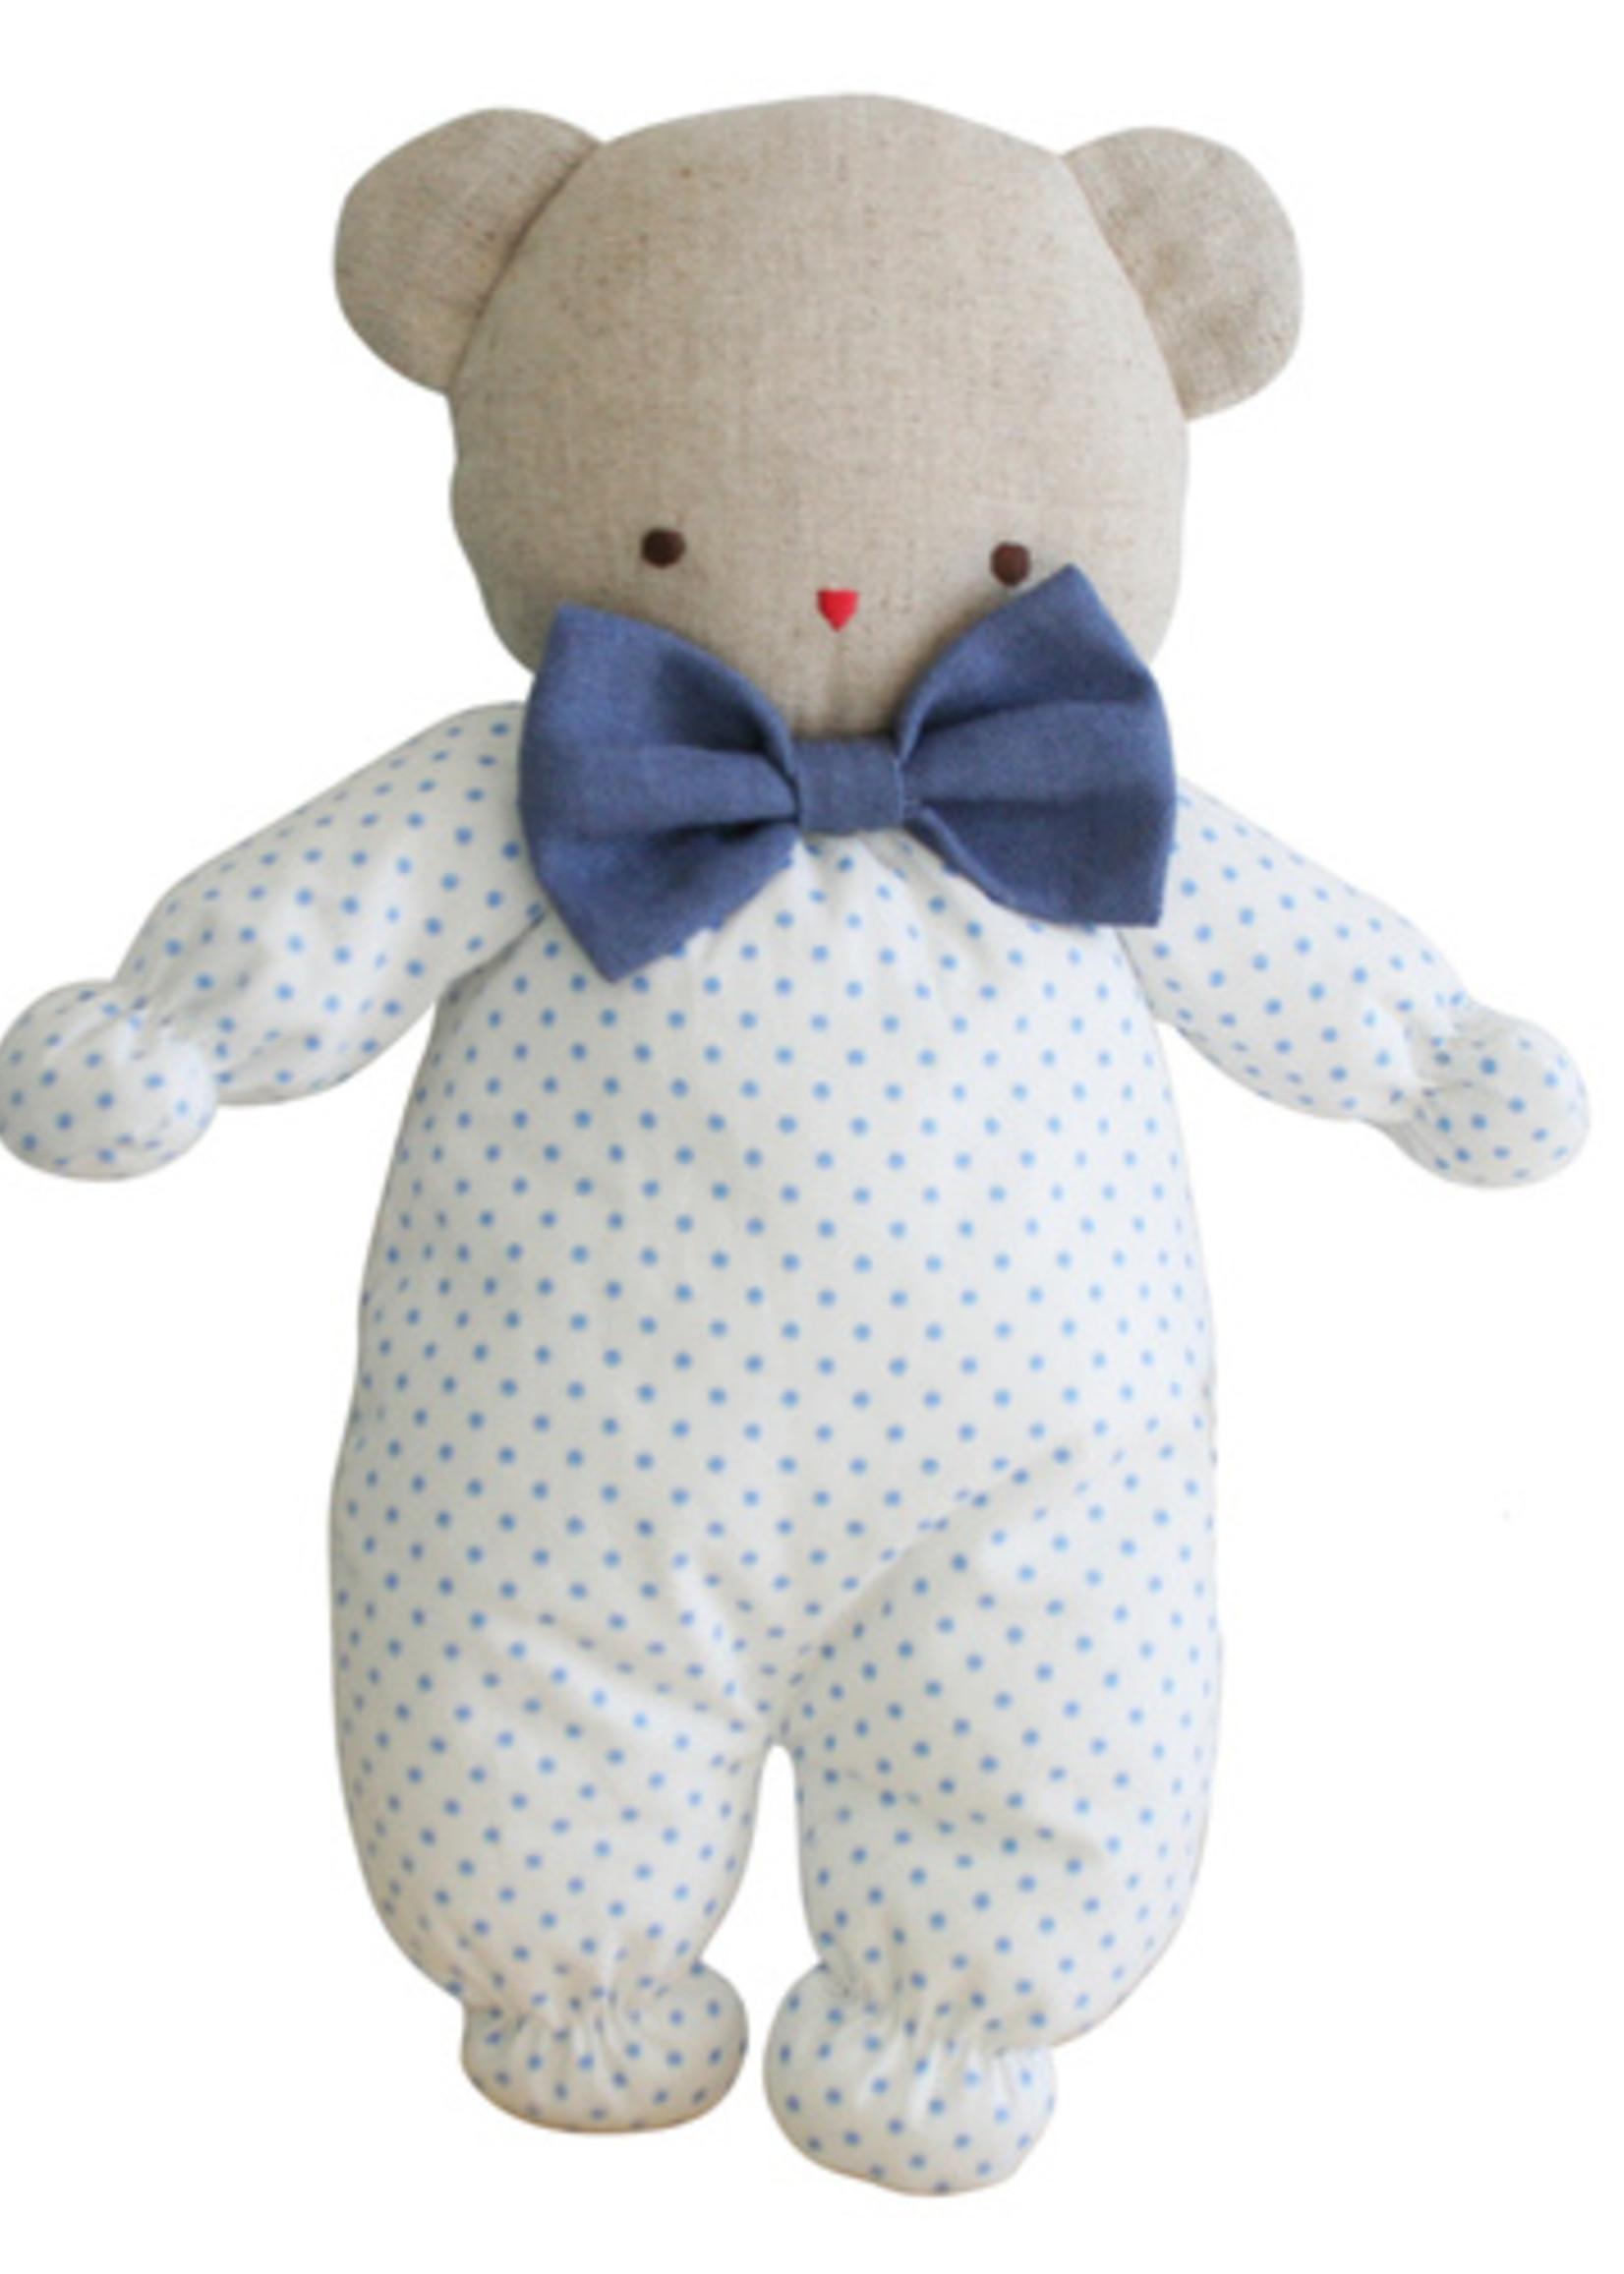 alimrose Asleep Awake Ted in Spotty Blue